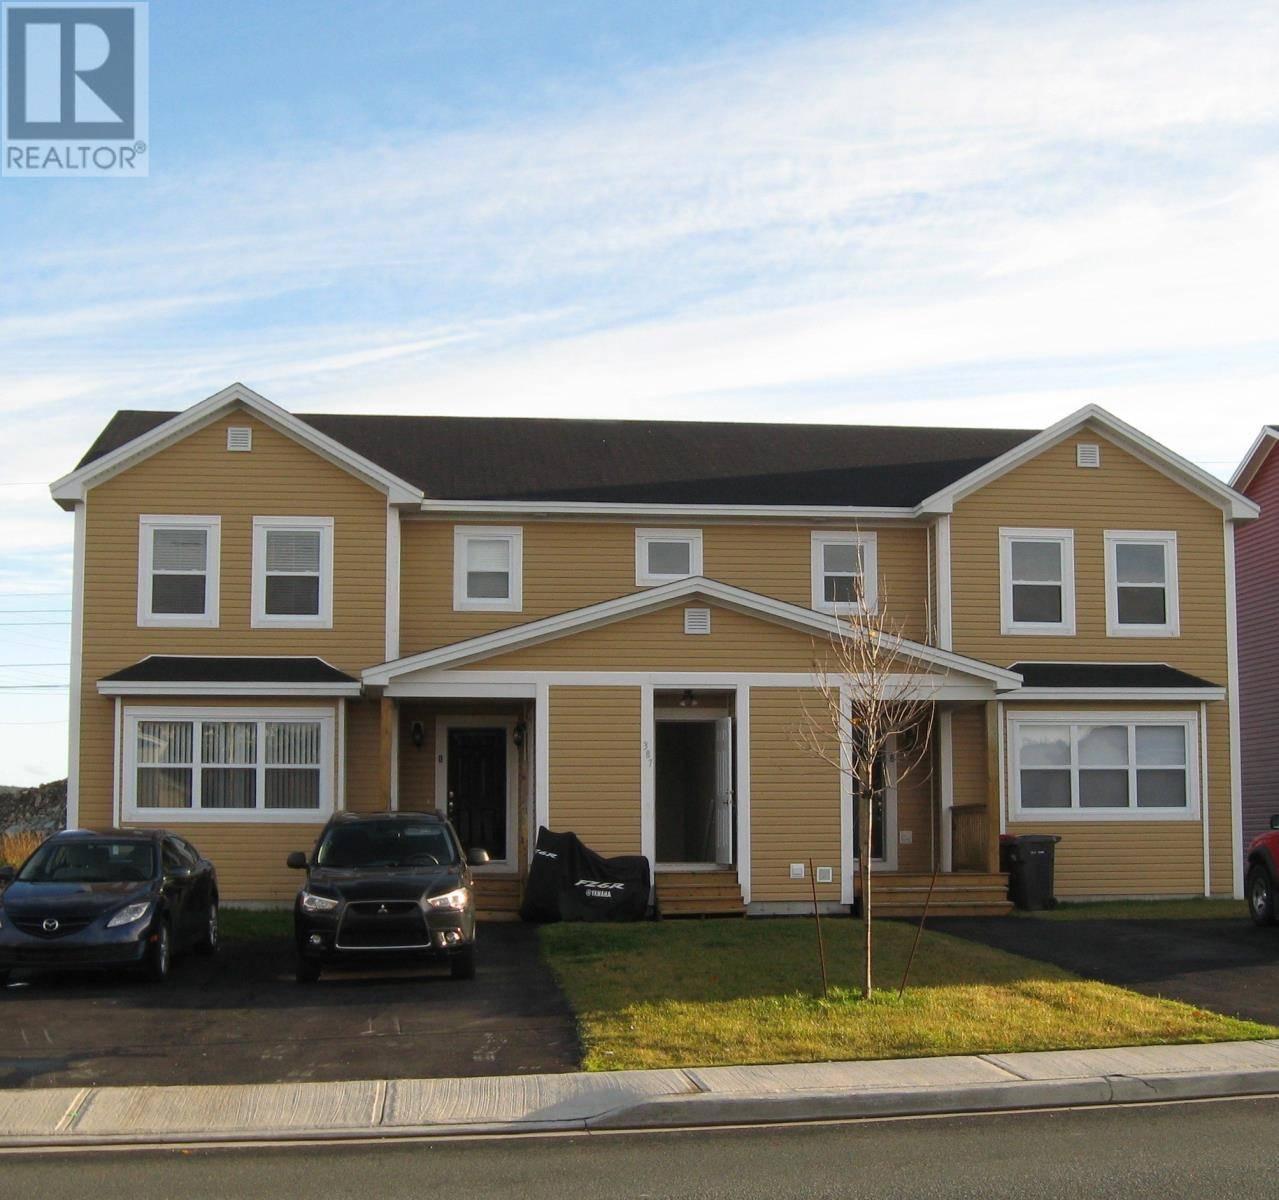 House for sale at 0 Blackmarsh Rd Unit 3 St. John's Newfoundland - MLS: 1202483